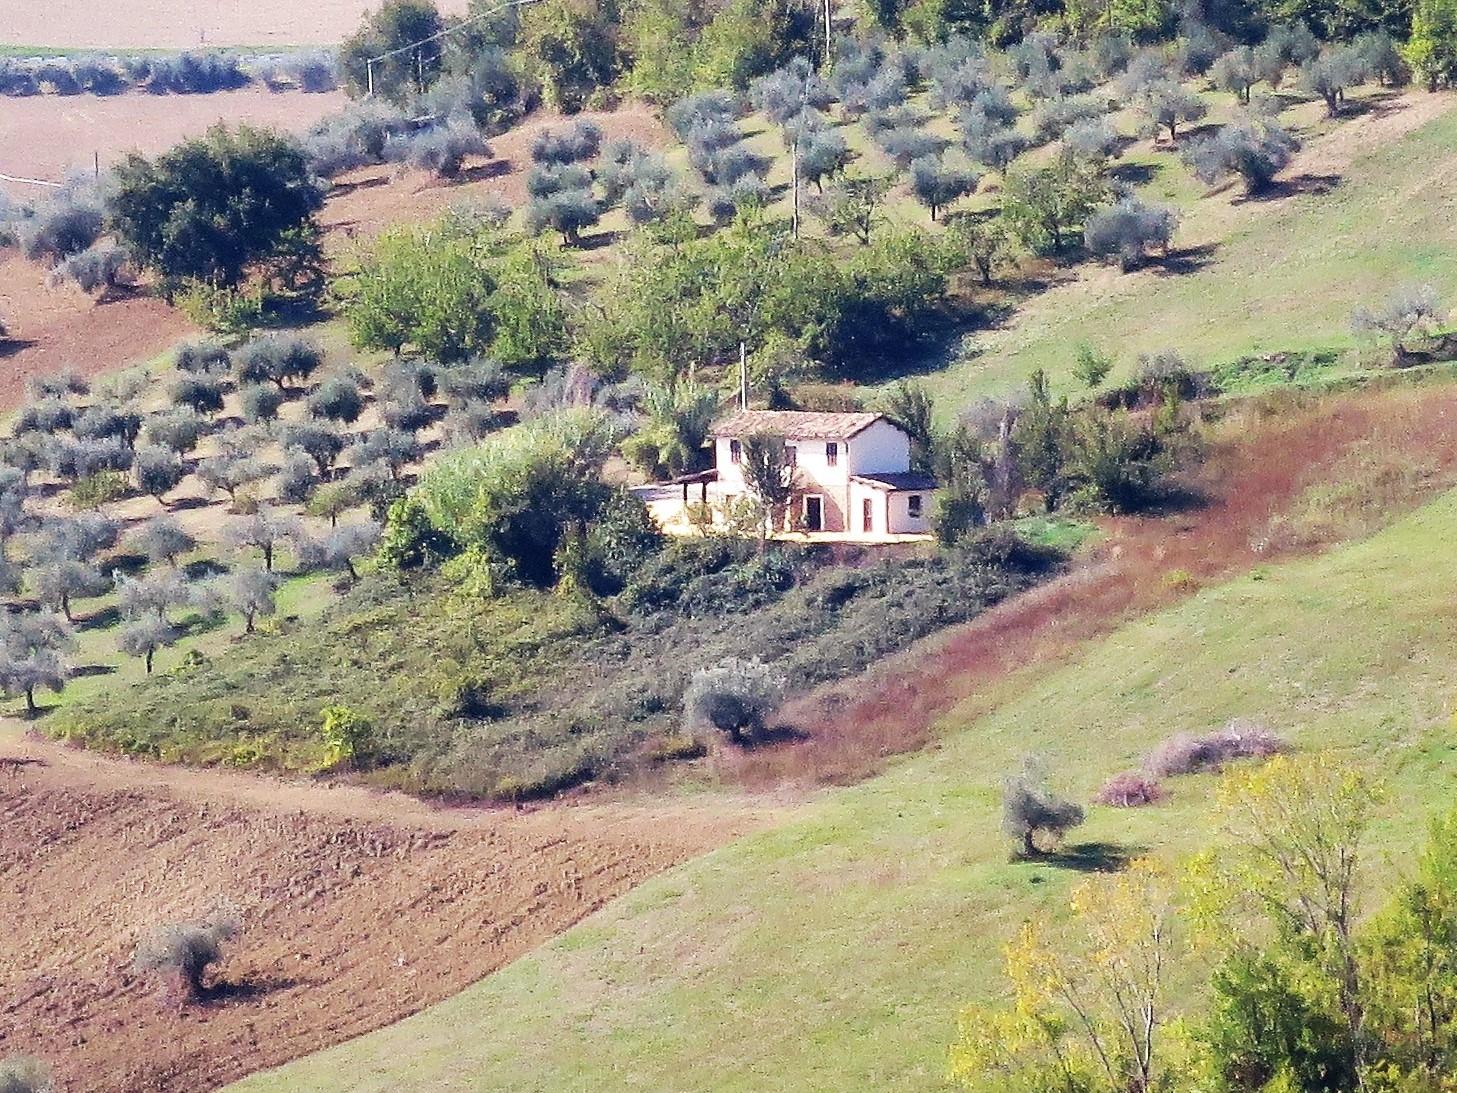 Country Houses Country Houses for sale Montefino (TE), Casa Collina - Montefino - EUR 159.972 430